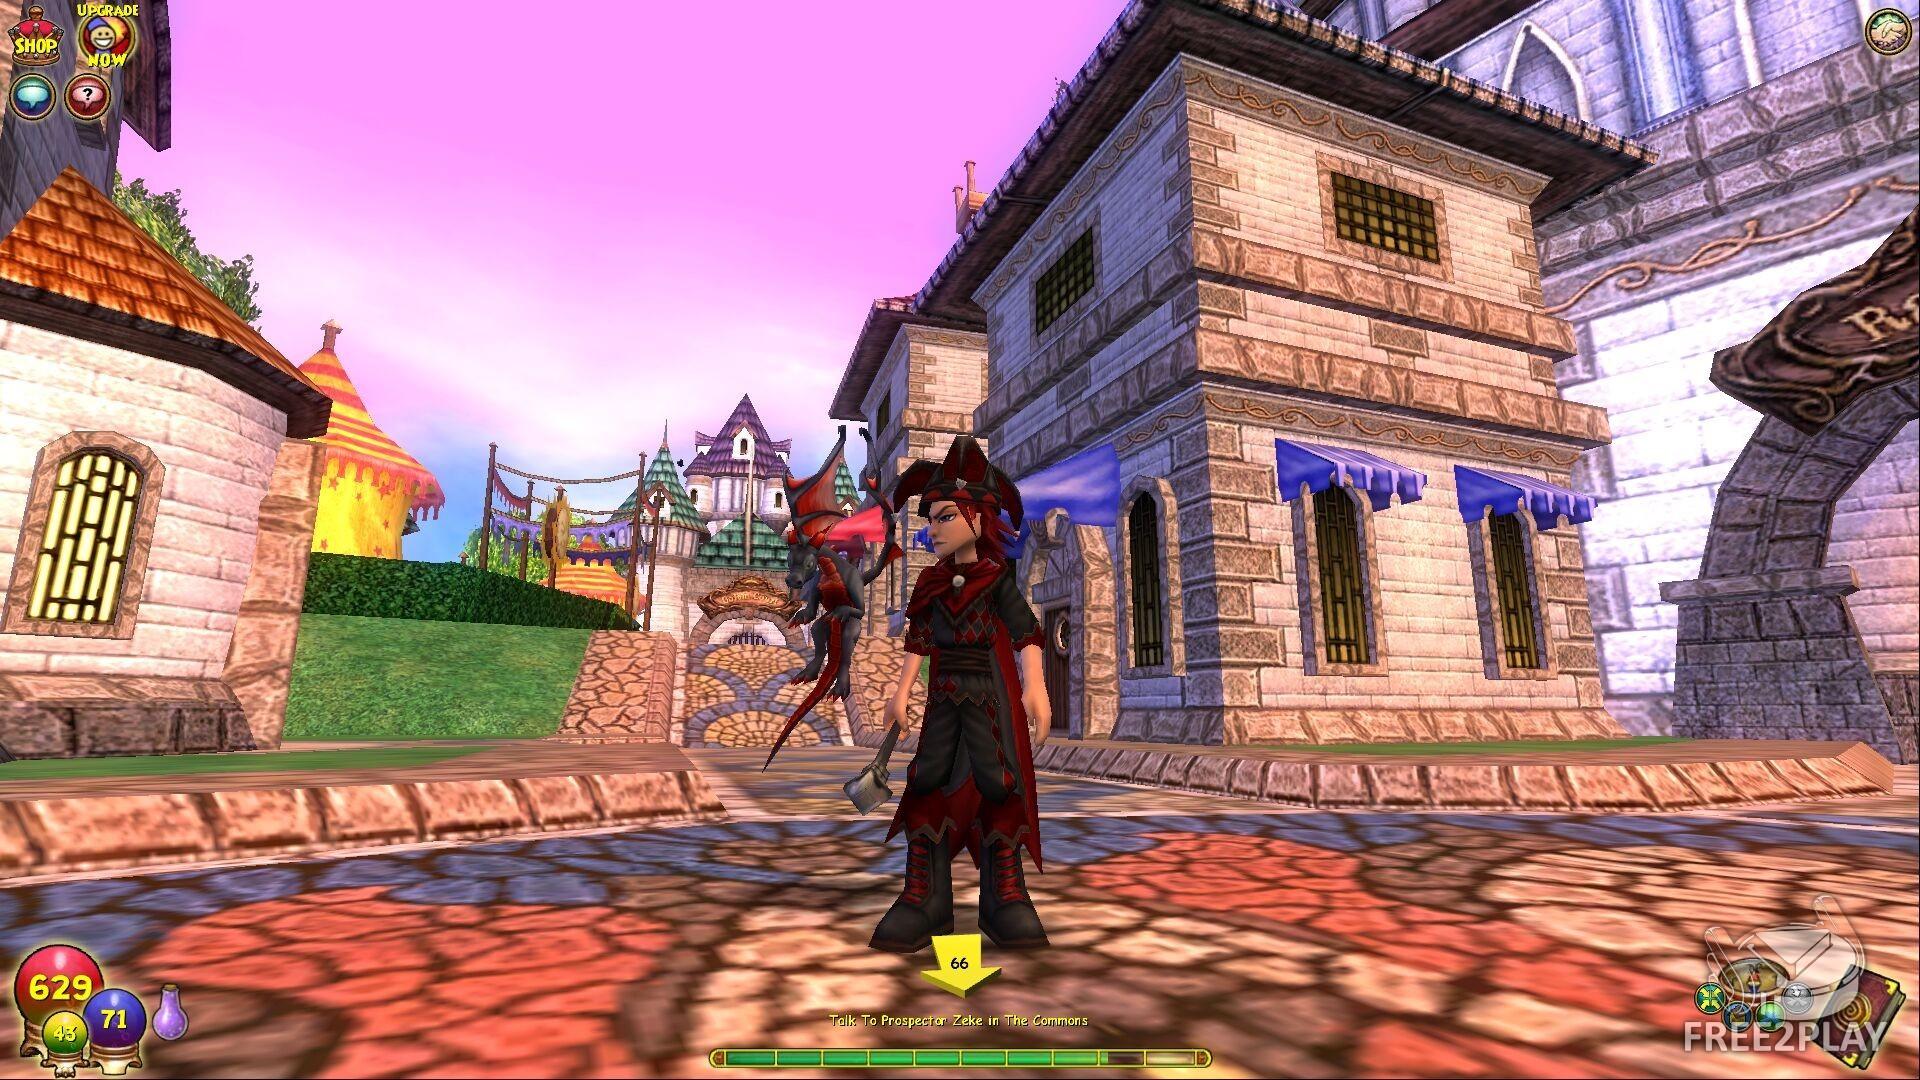 Res: 1920x1080, Wizard 101 screenshot ...